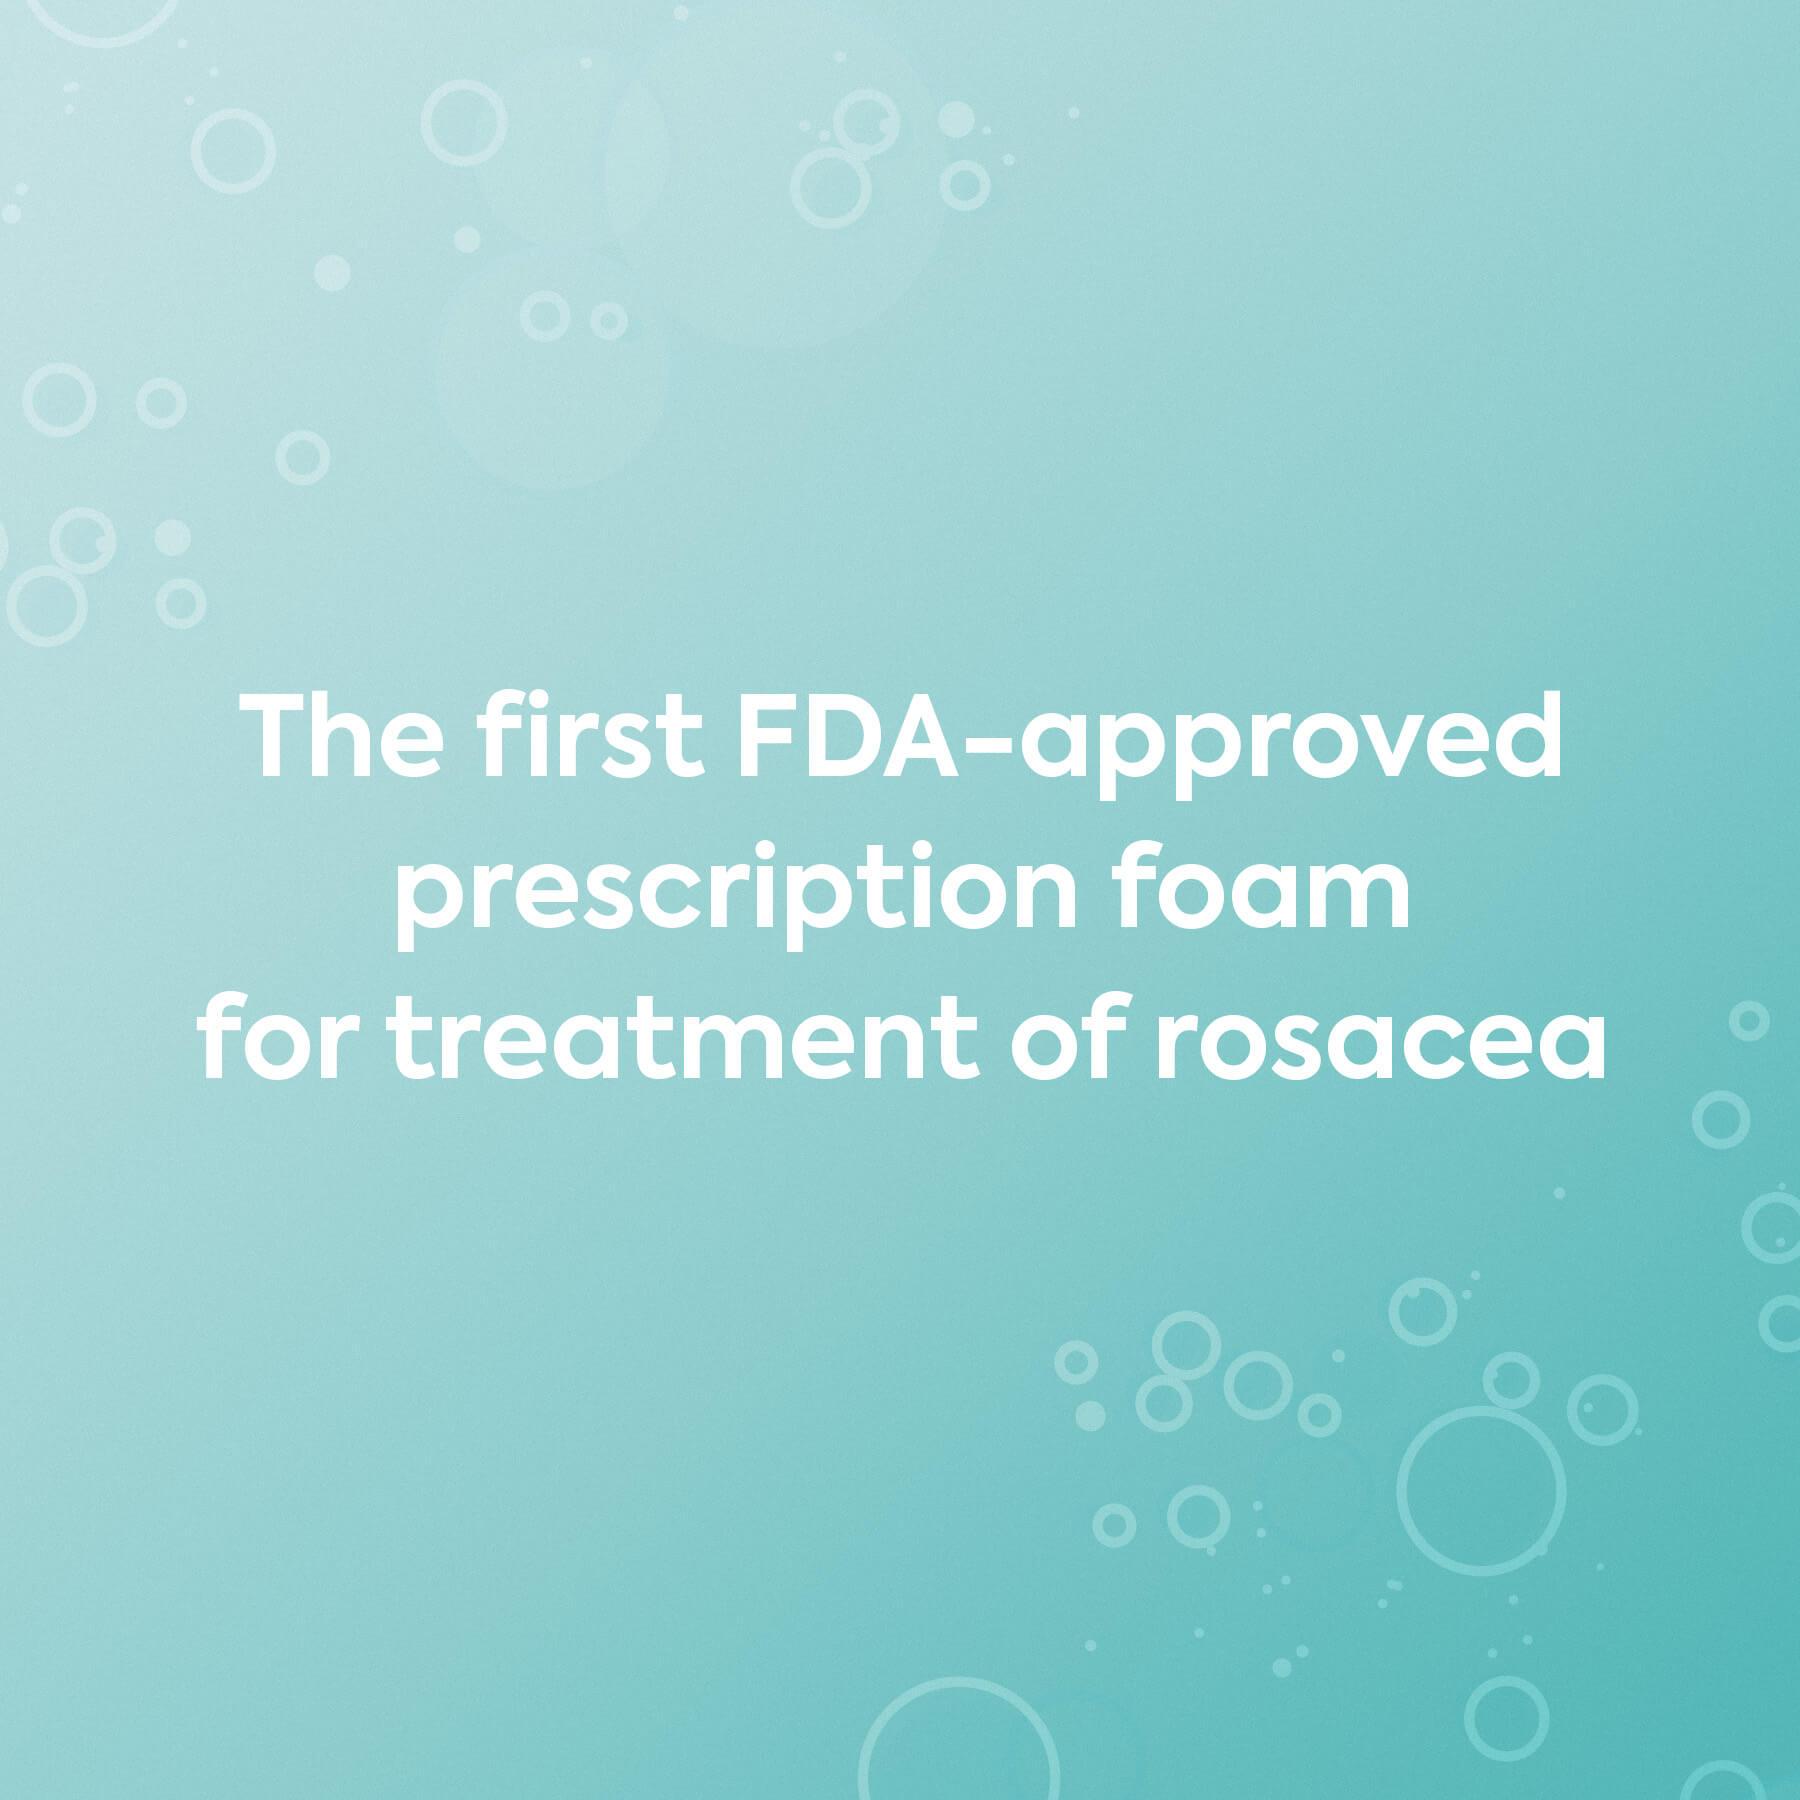 Finacea Foam First FDA-Approved Prescription Foam